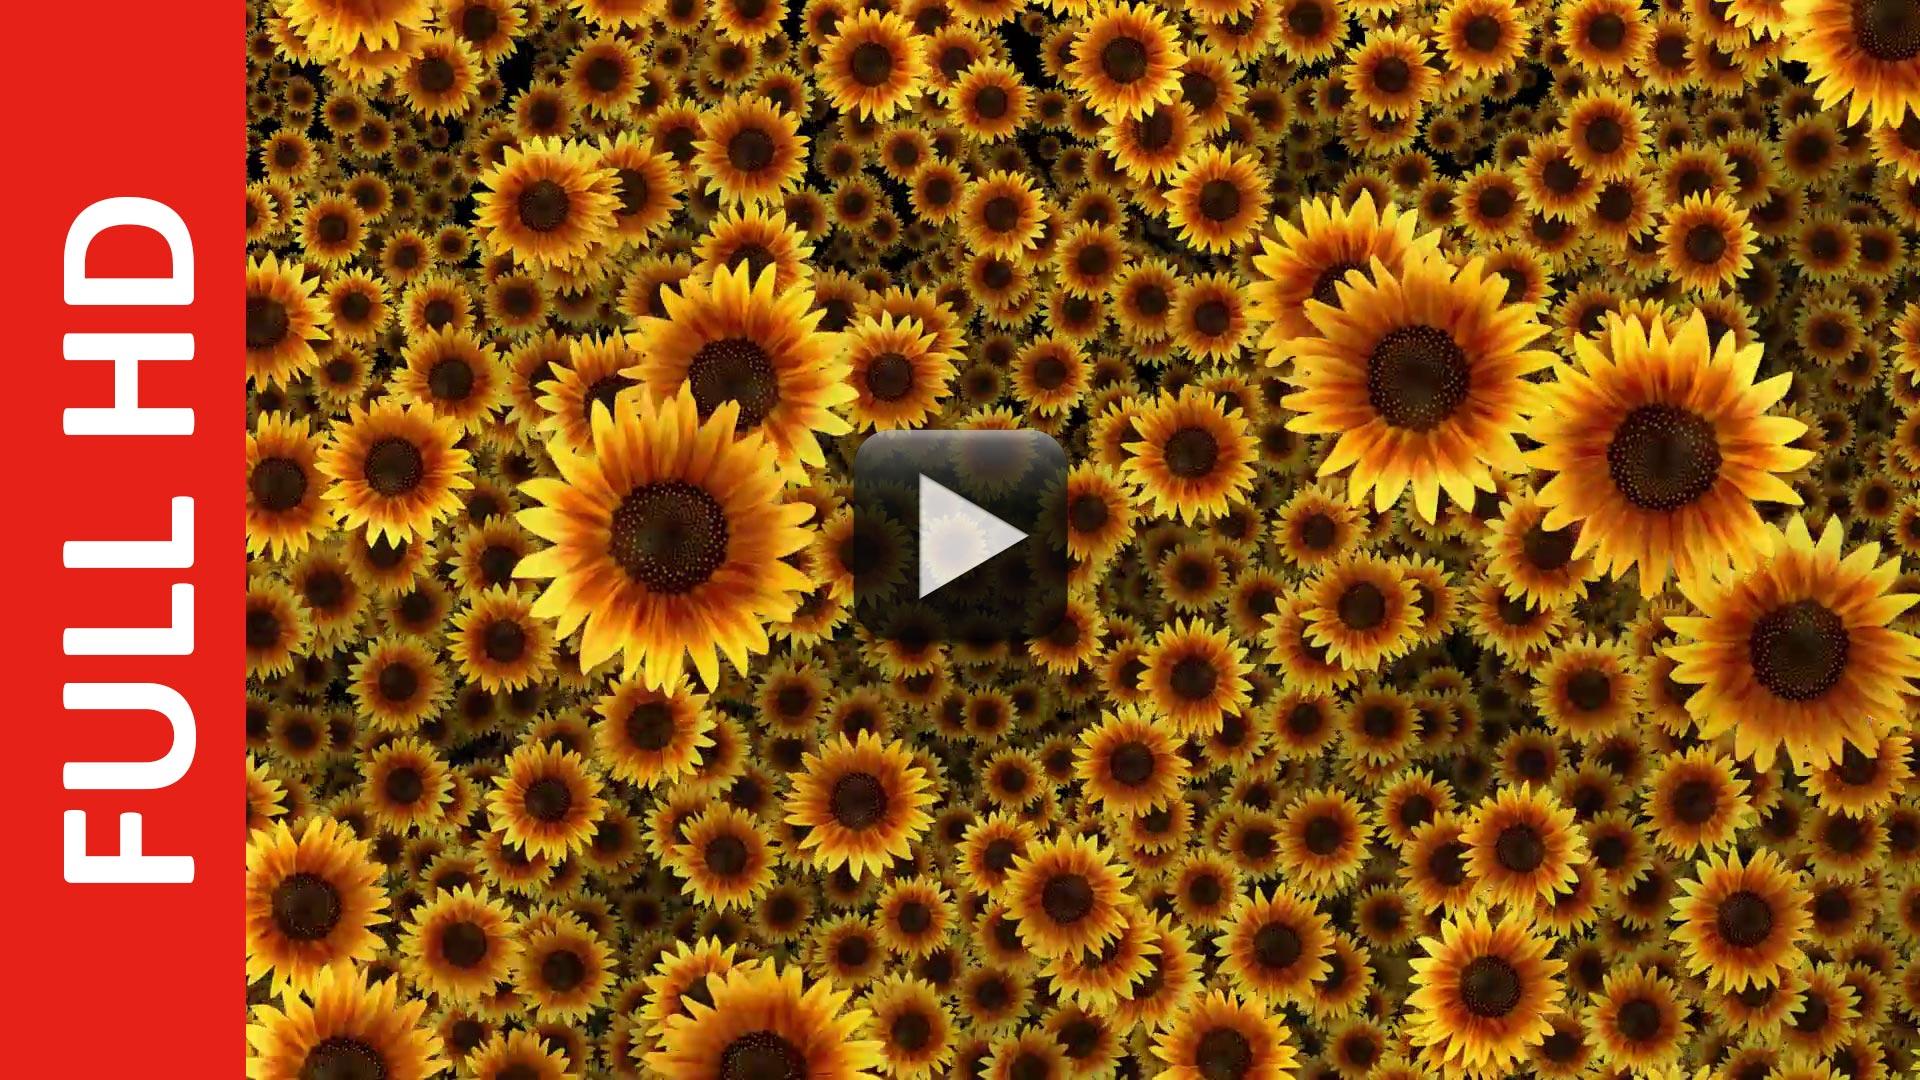 Beautiful sunflowers video background hd 1080p all design creative izmirmasajfo